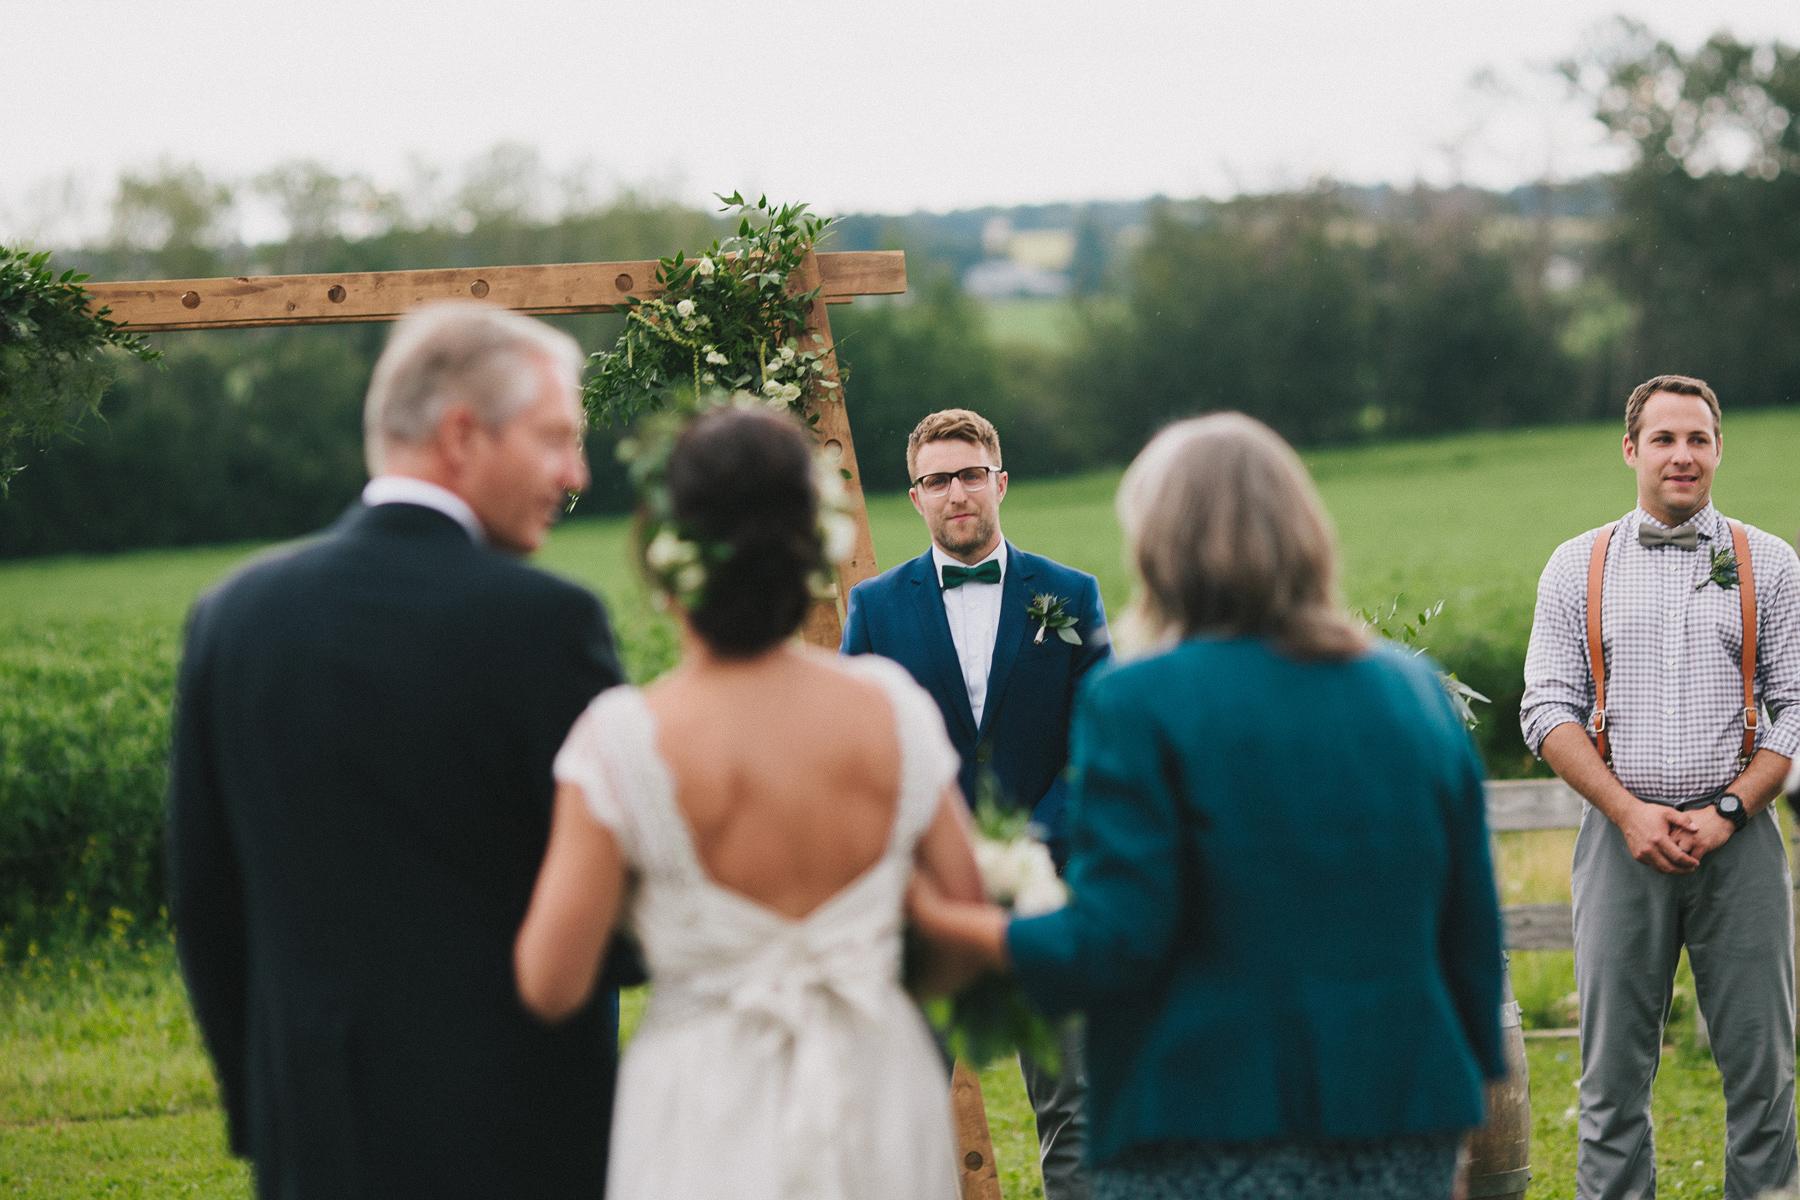 alberta-farm-wedding-photographer-rp-wj-100.jpg